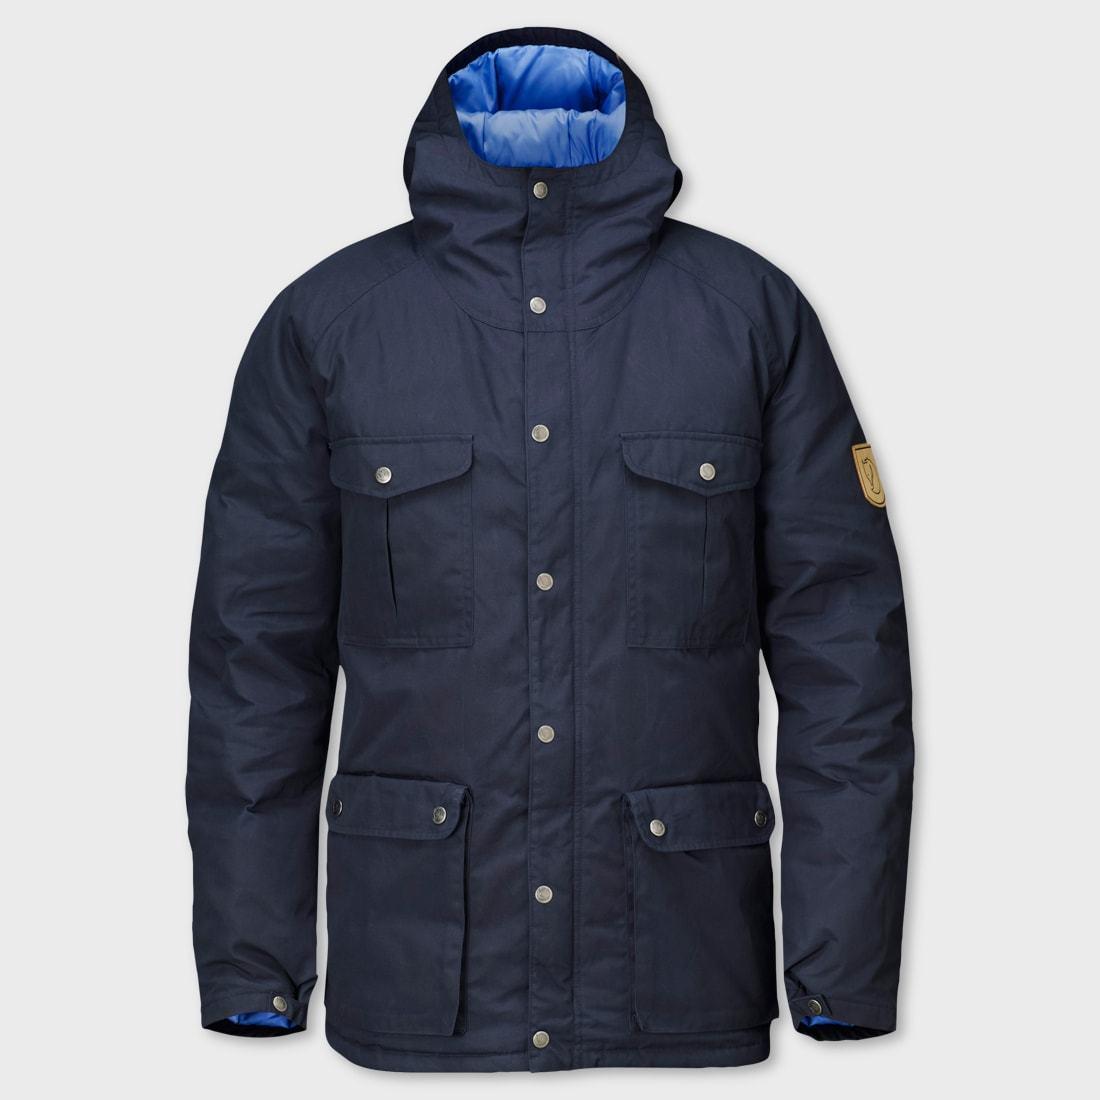 fjallraven-greenland-down-jacket-dark-navy-min.jpg